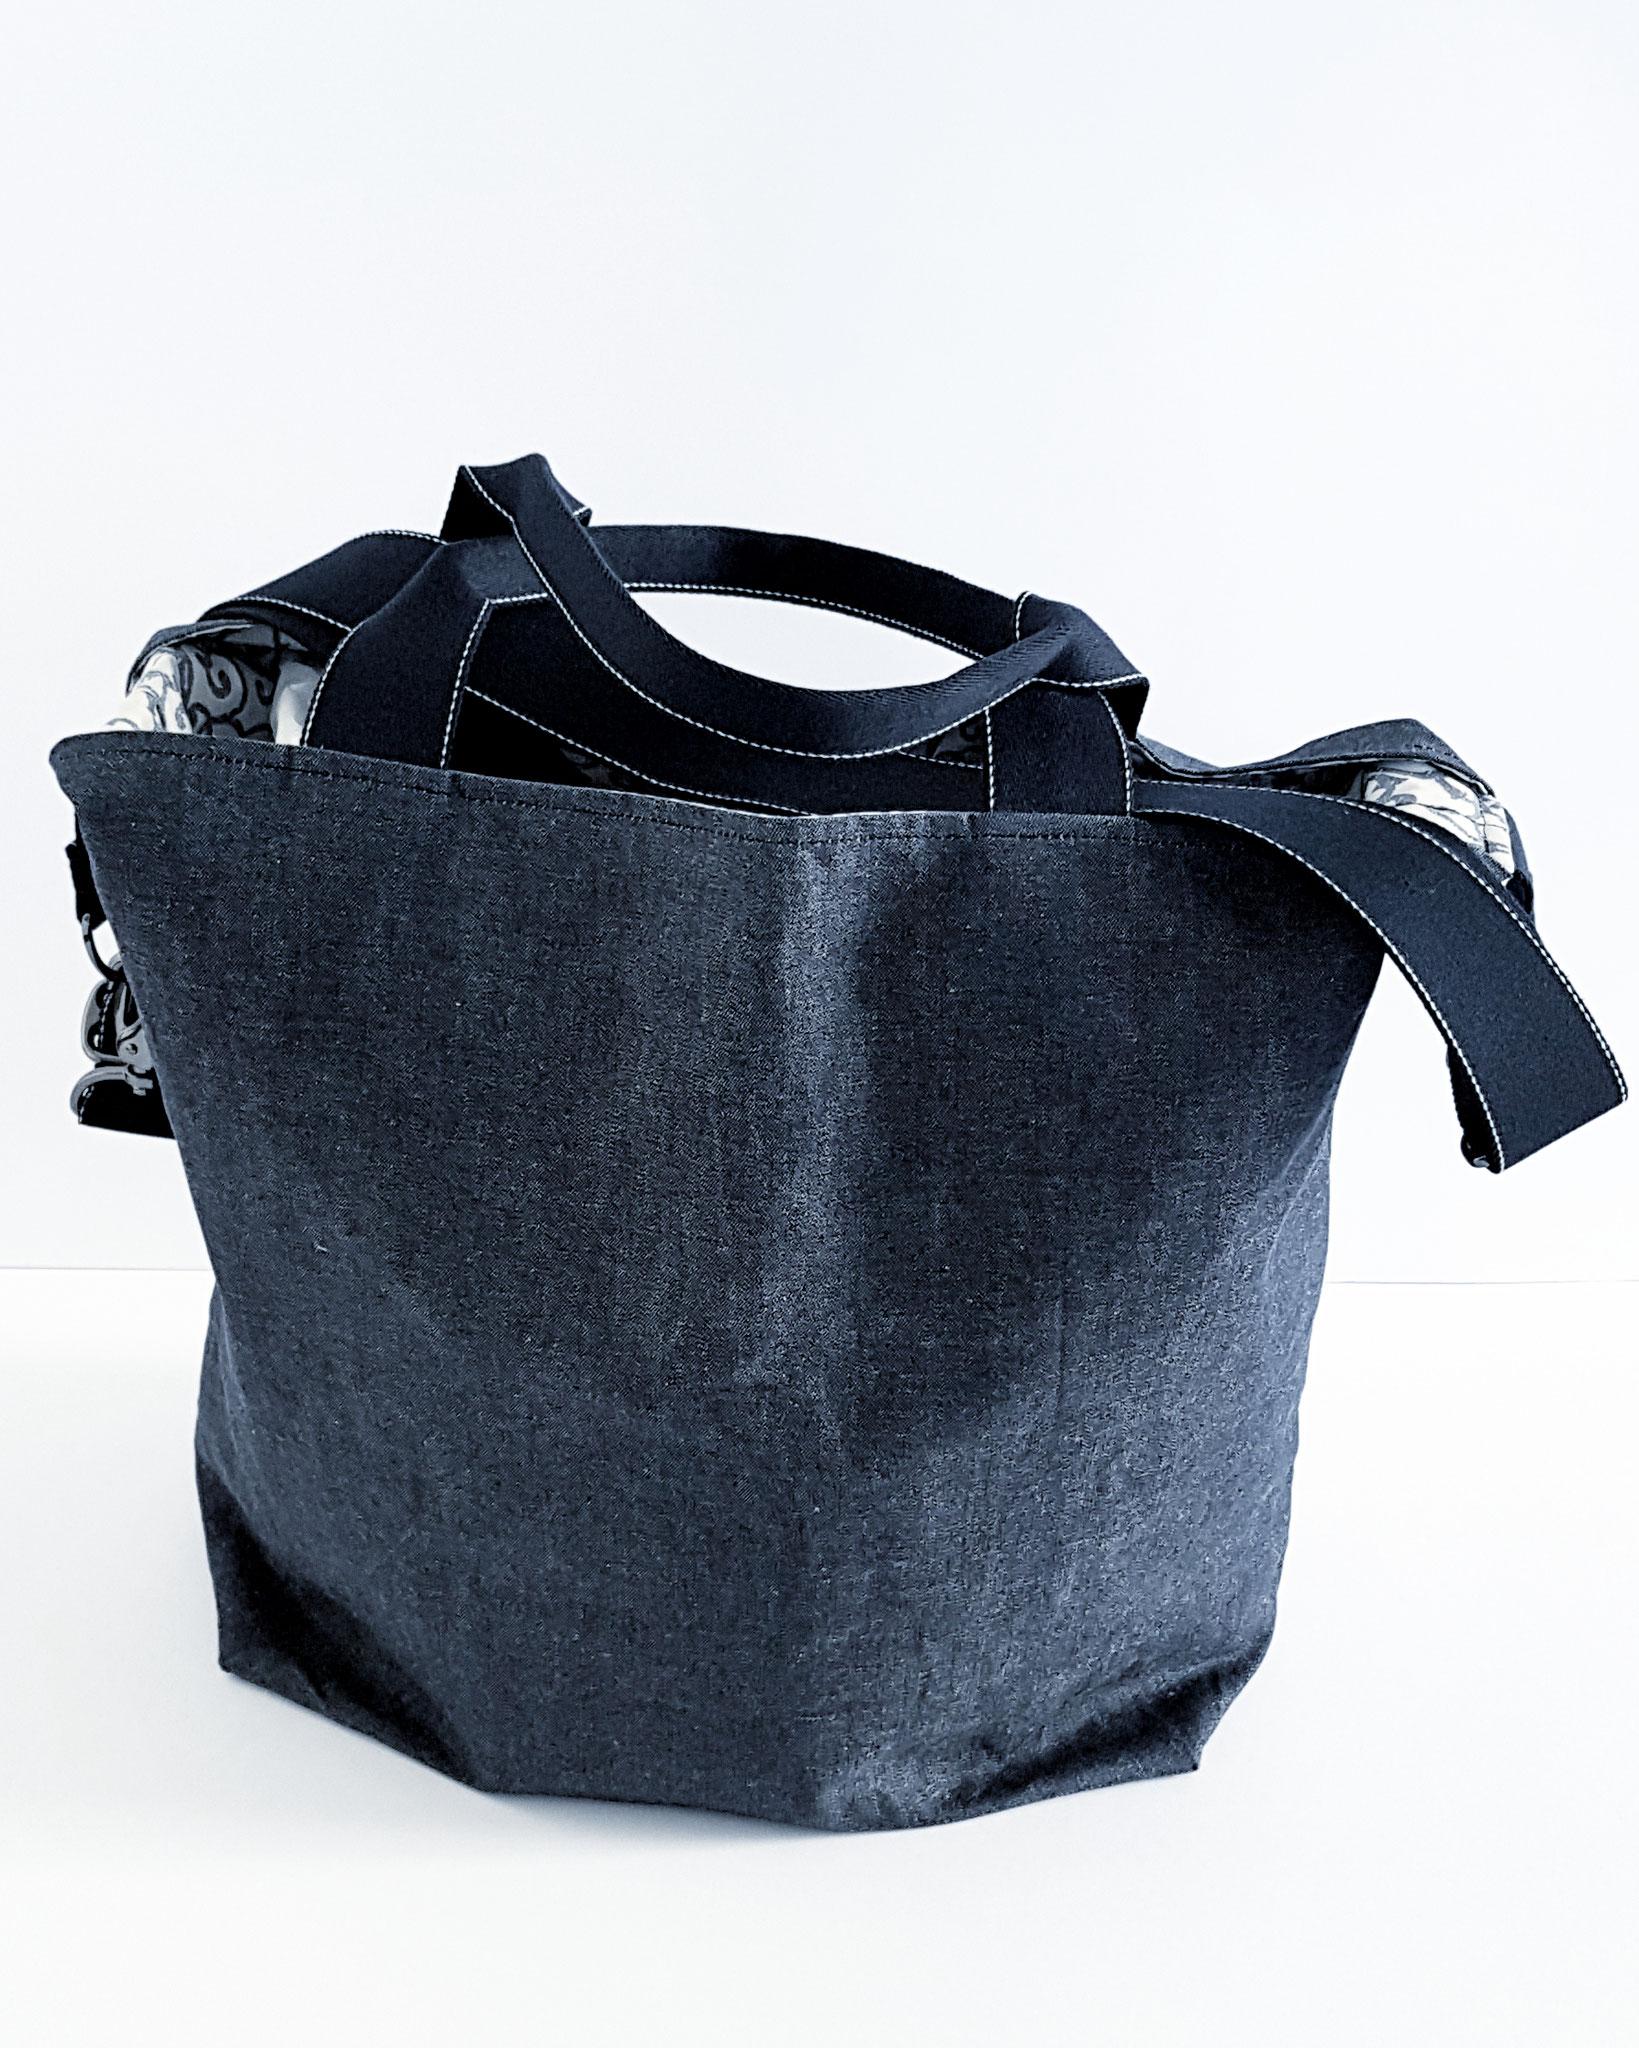 Shopper, trockener Oilskin Jeans, verkauft